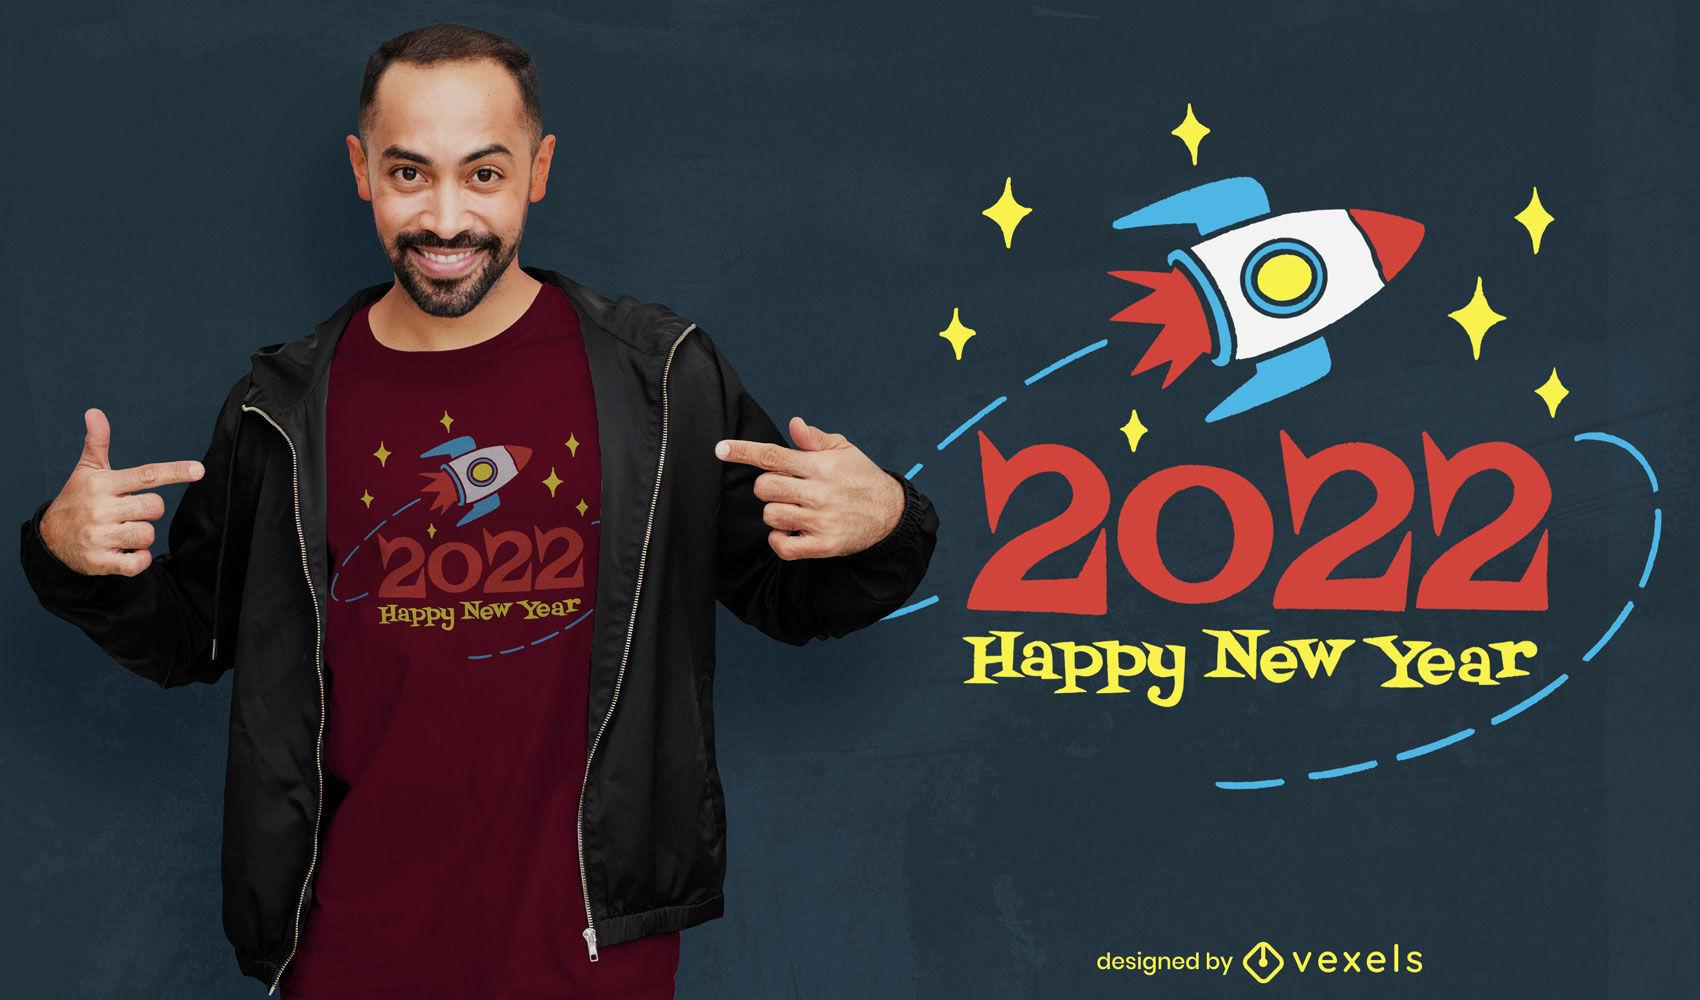 2022 happy new year rocket t-shirt design